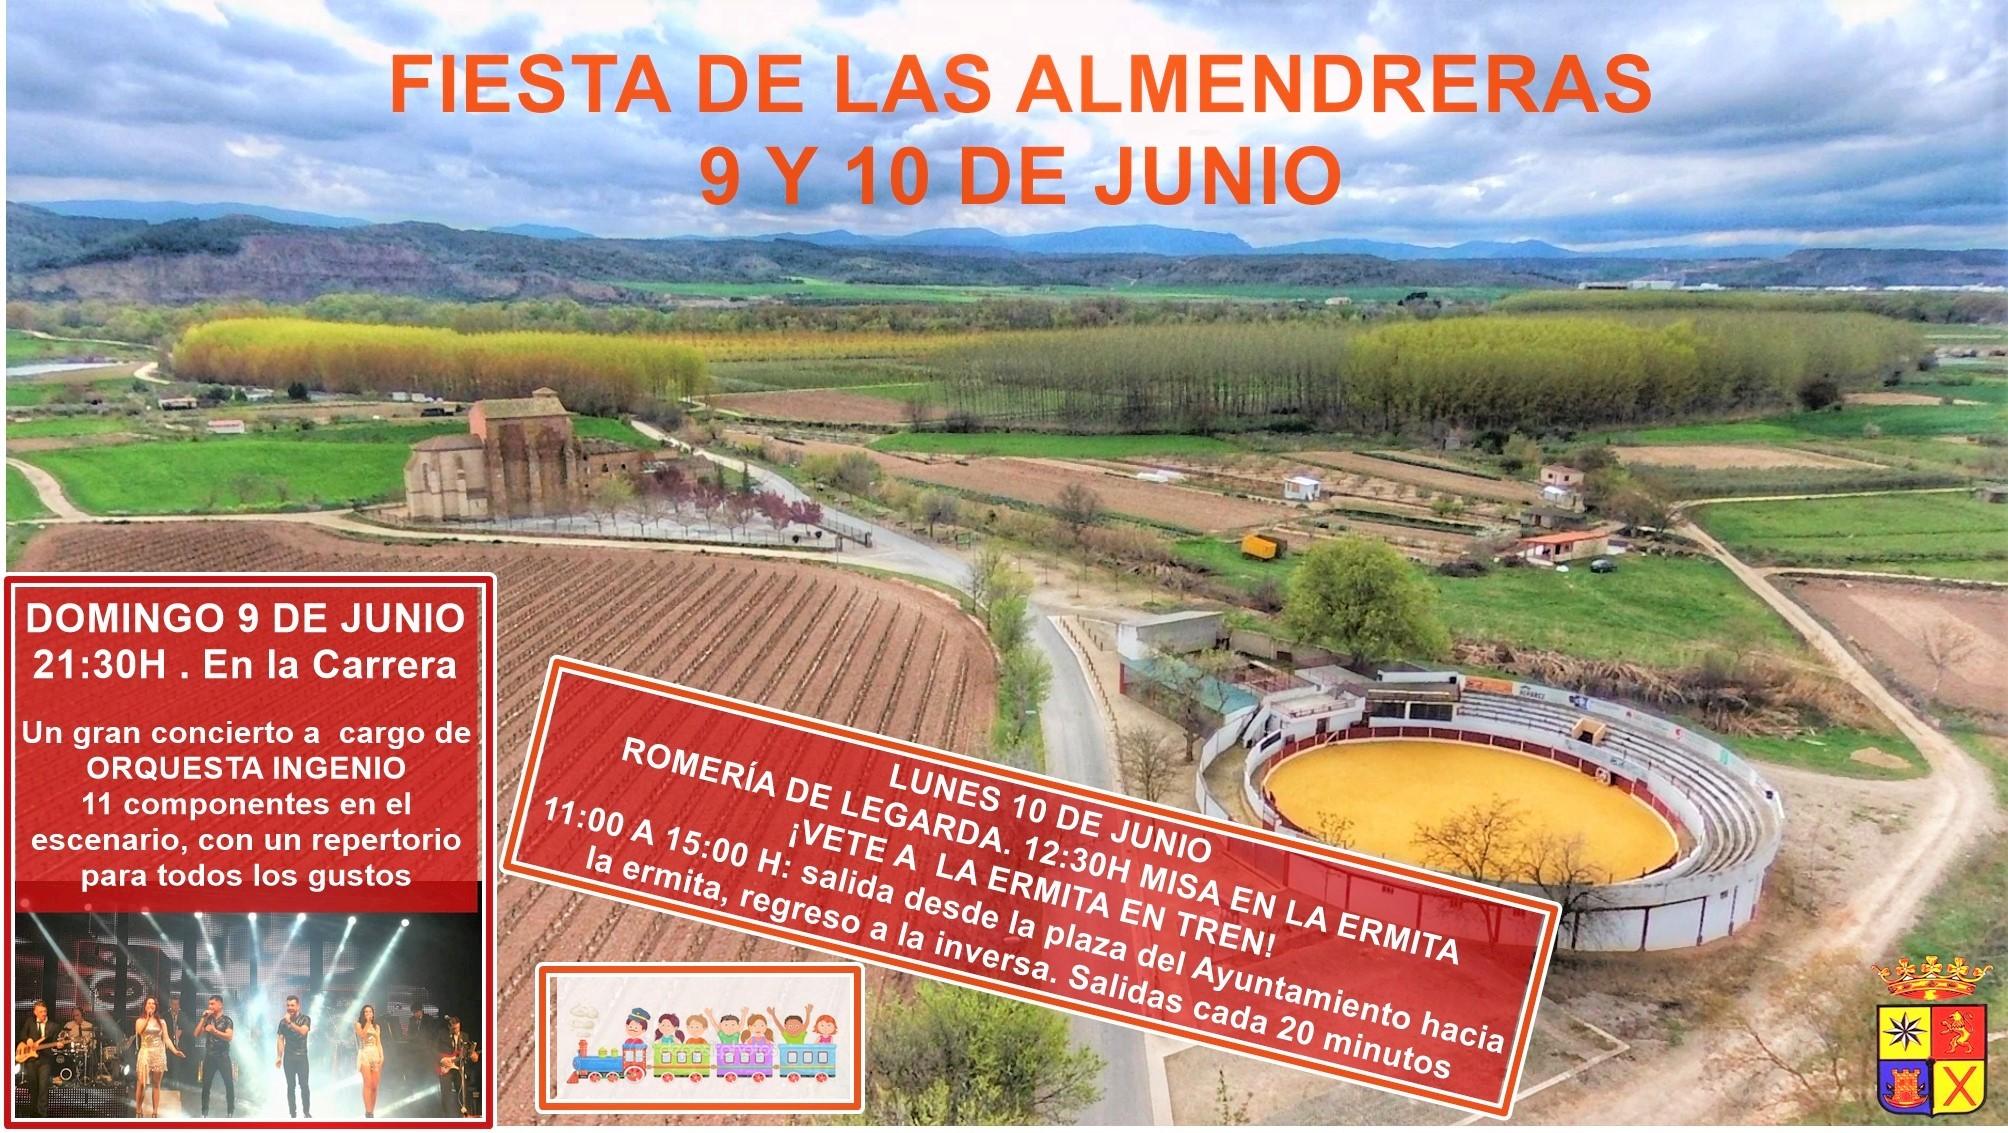 Fiesta de las almendreras 2019 - Mendavia (Navarra)